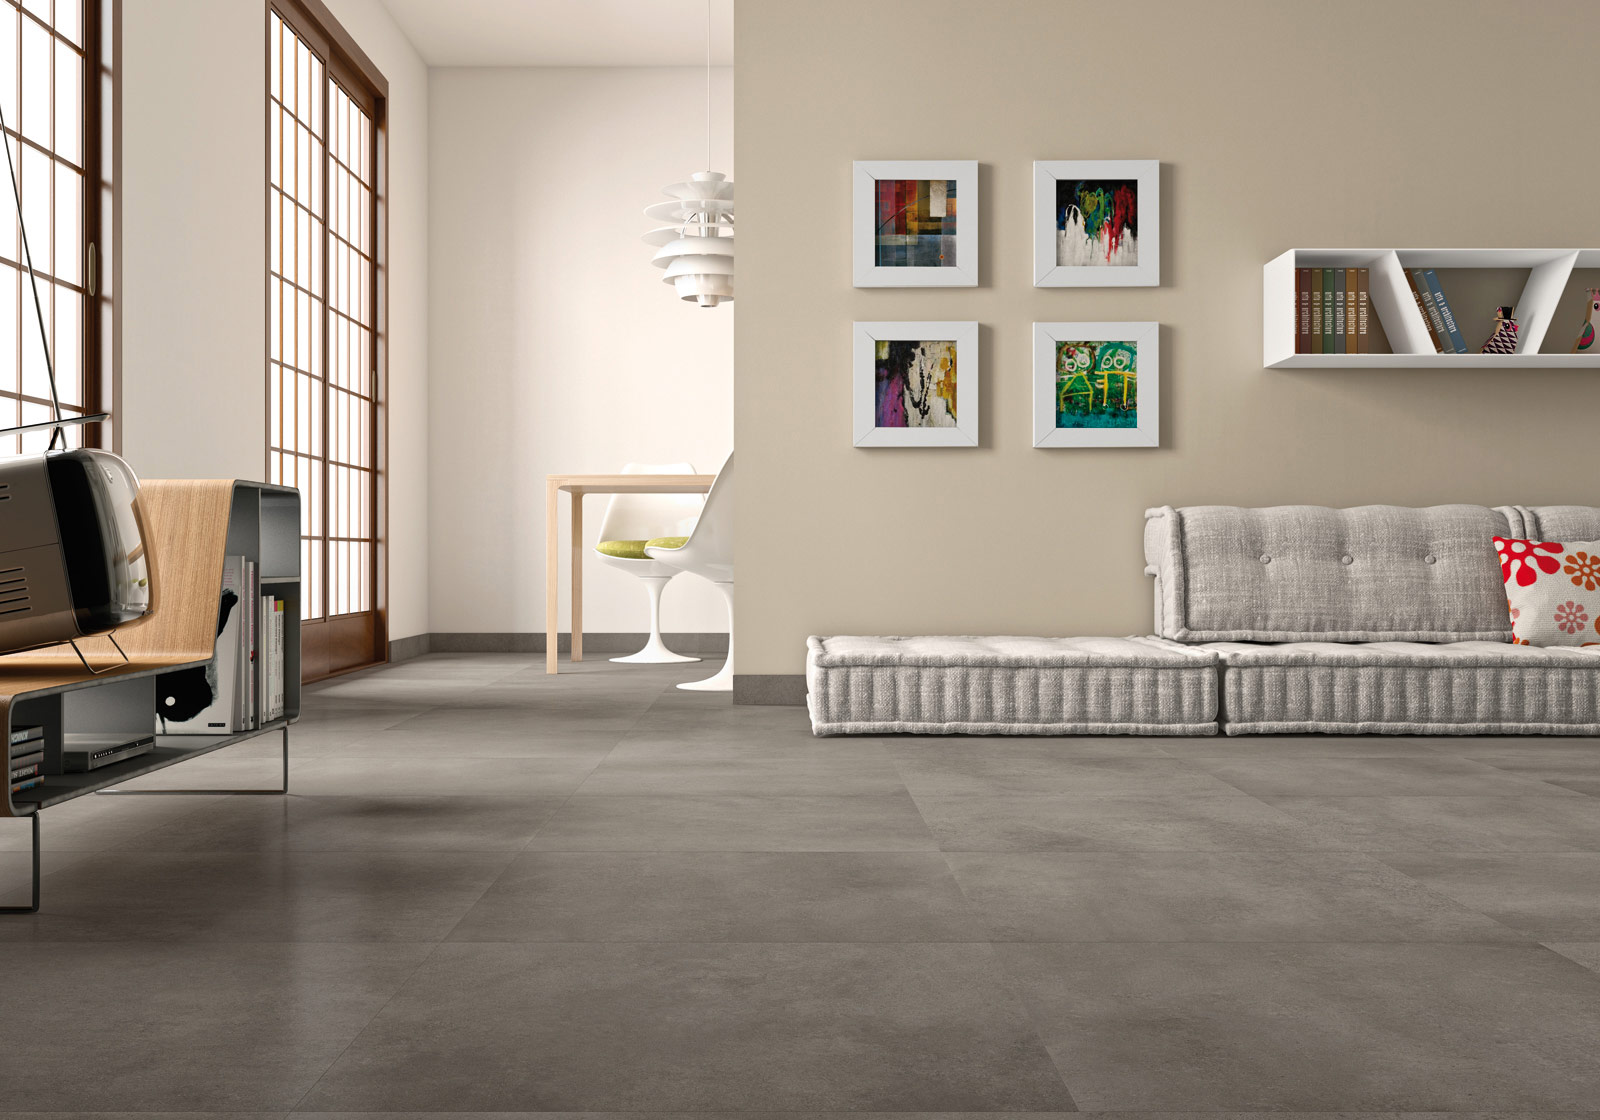 Photo gres porcellanato floor tiles images denver gres gres porcellanato floor tiles denver gres porcellanato effetto cemento marazzi dailygadgetfo Choice Image